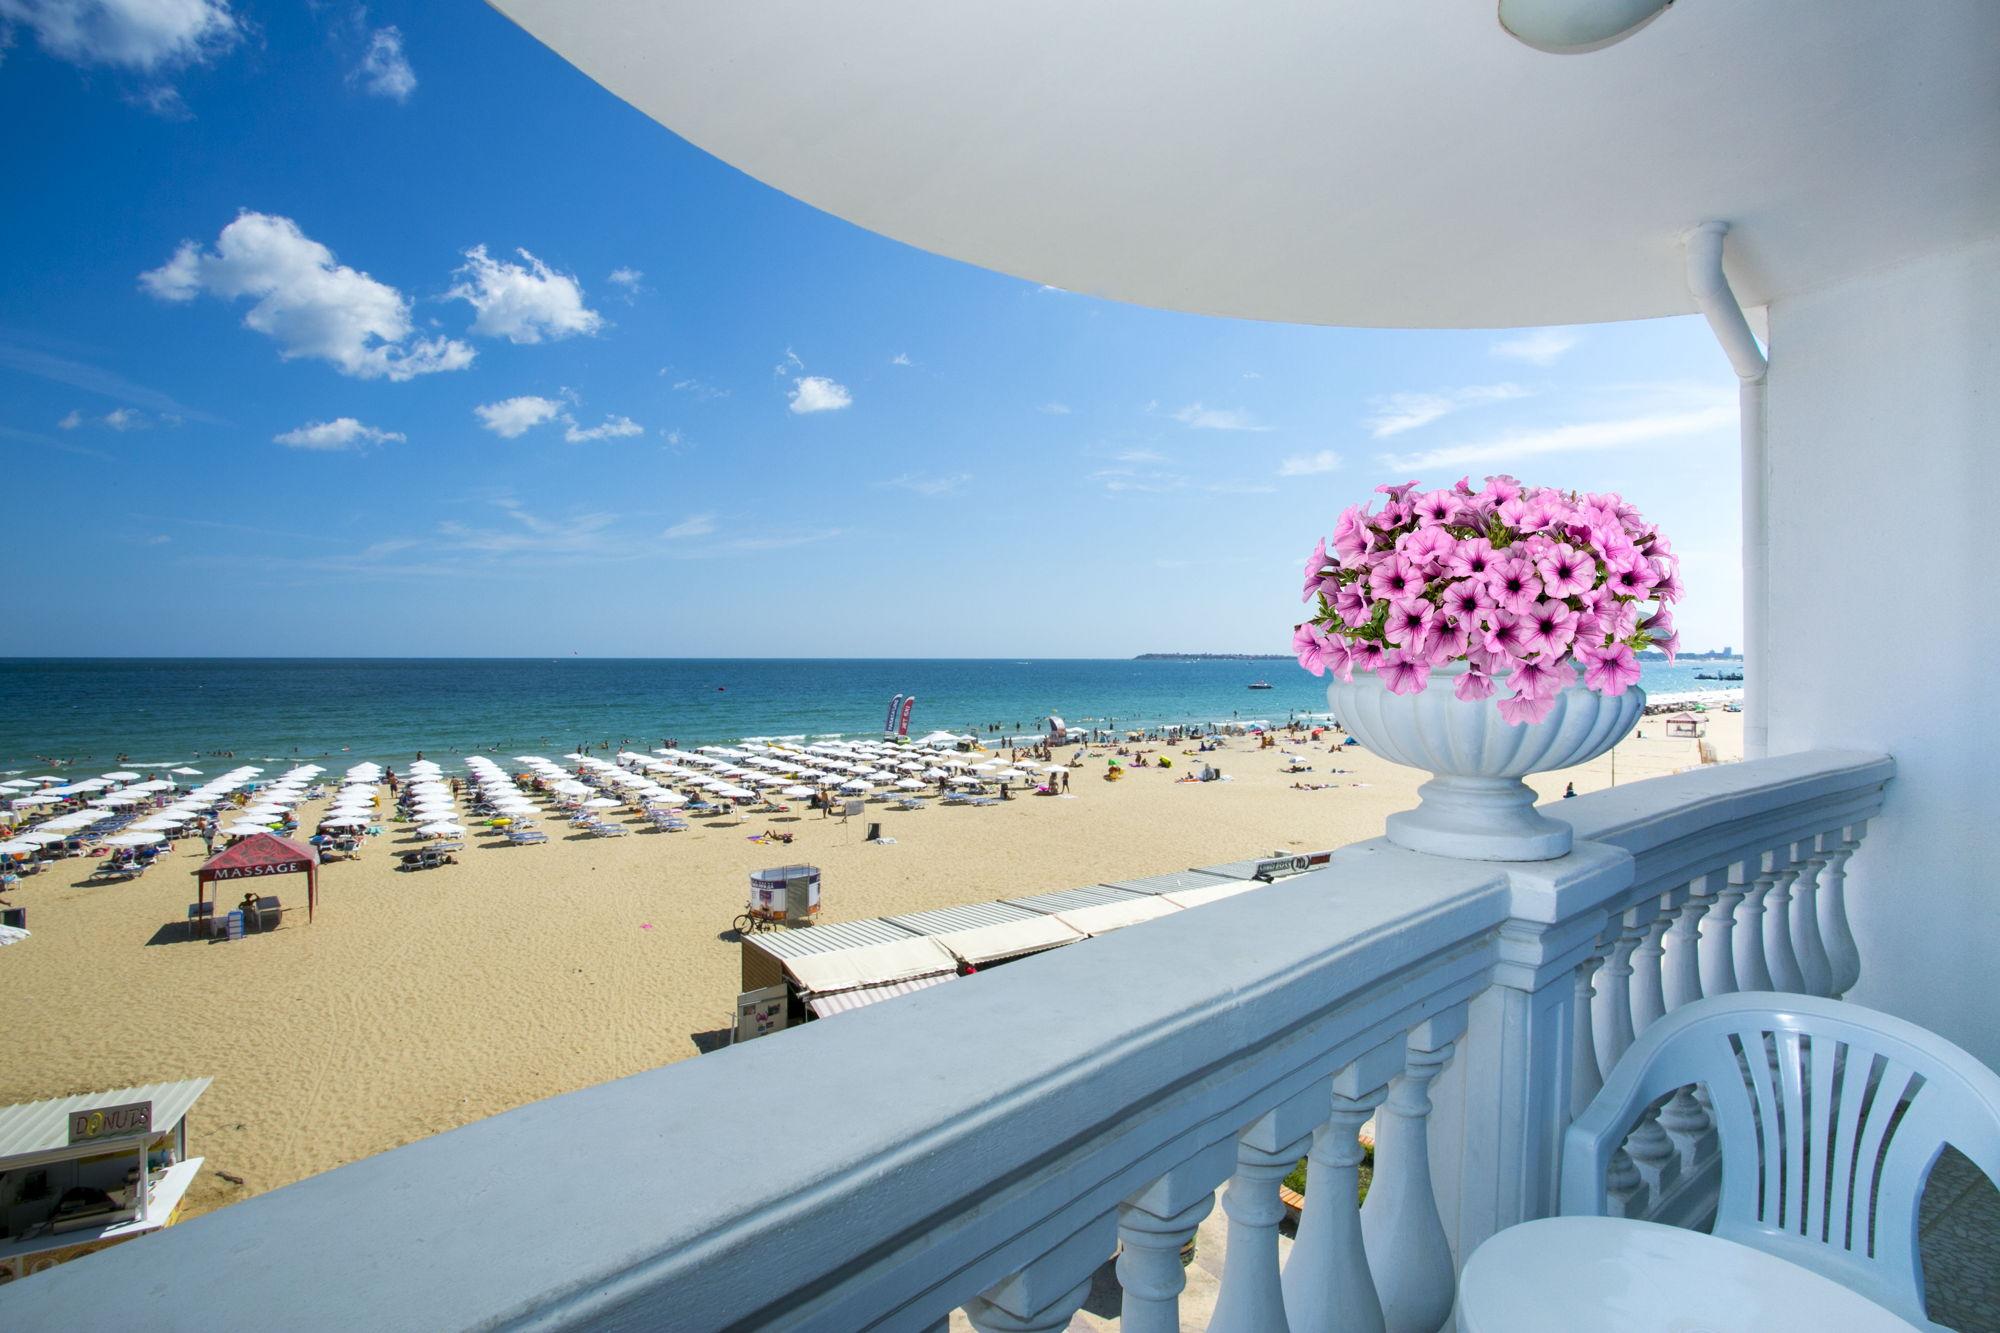 Гледка Плаж | Чайка Бийч Резорт